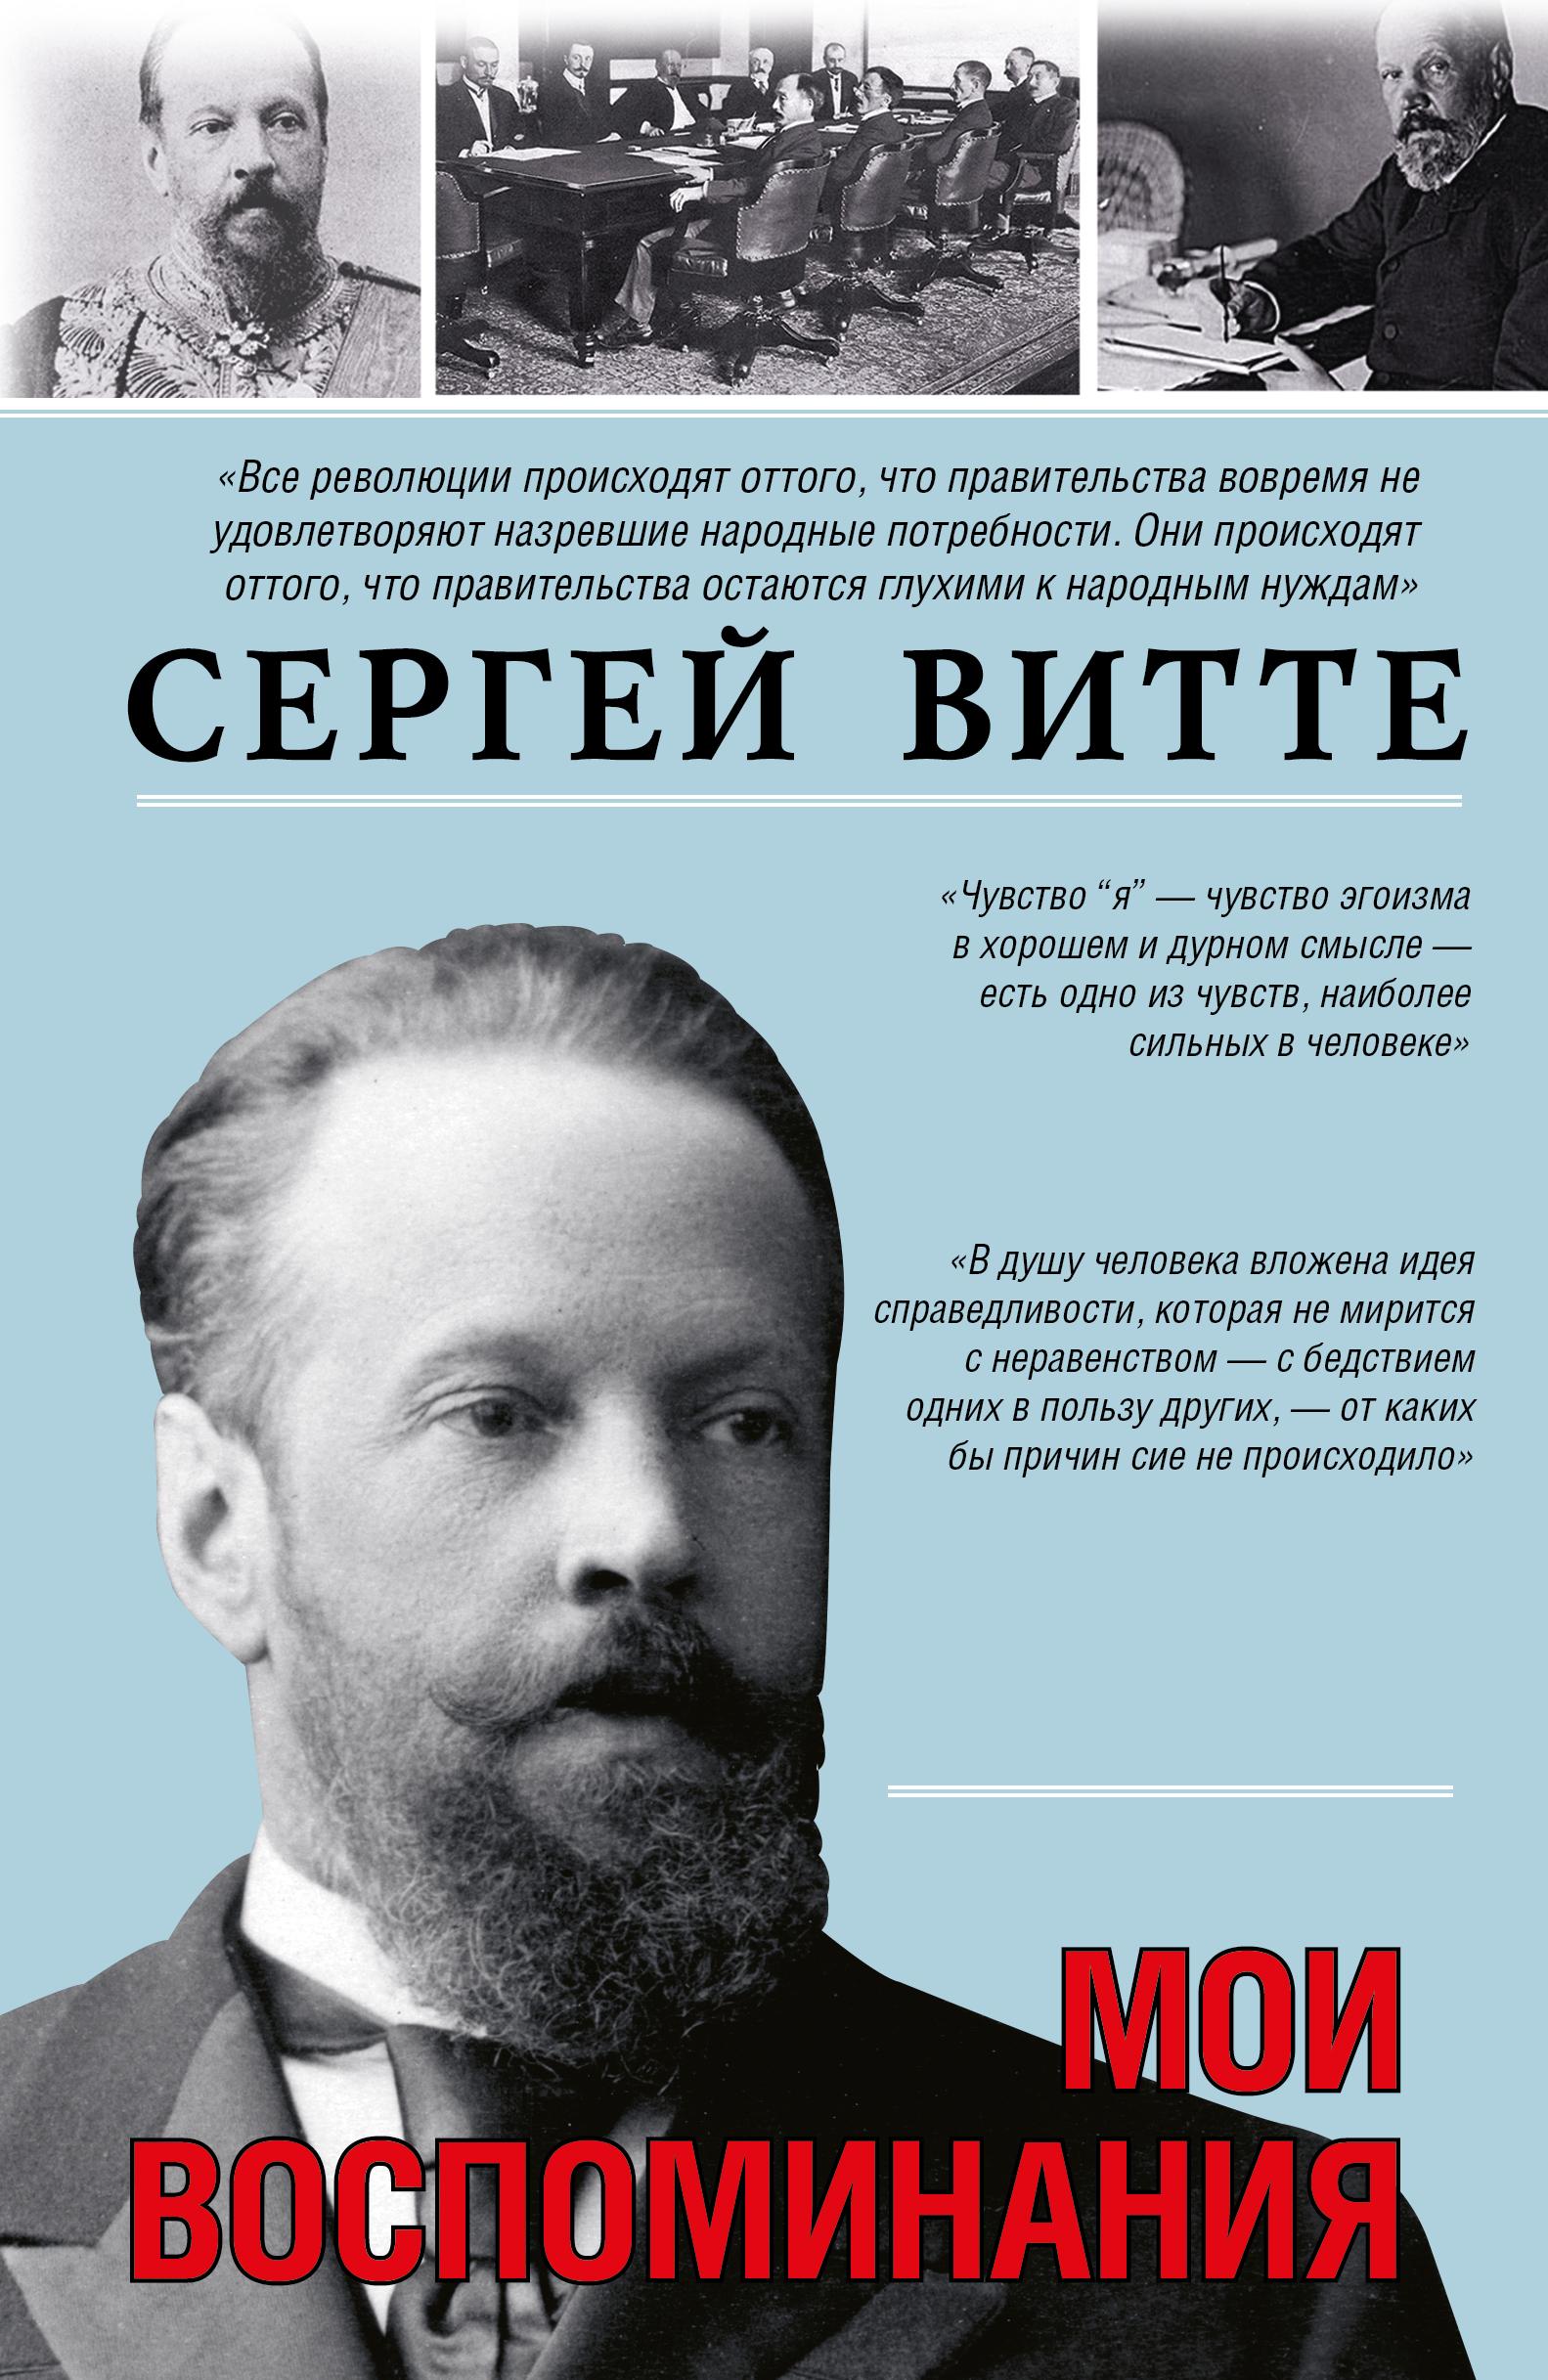 Витте Сергей Юльевич Мои воспоминания цена